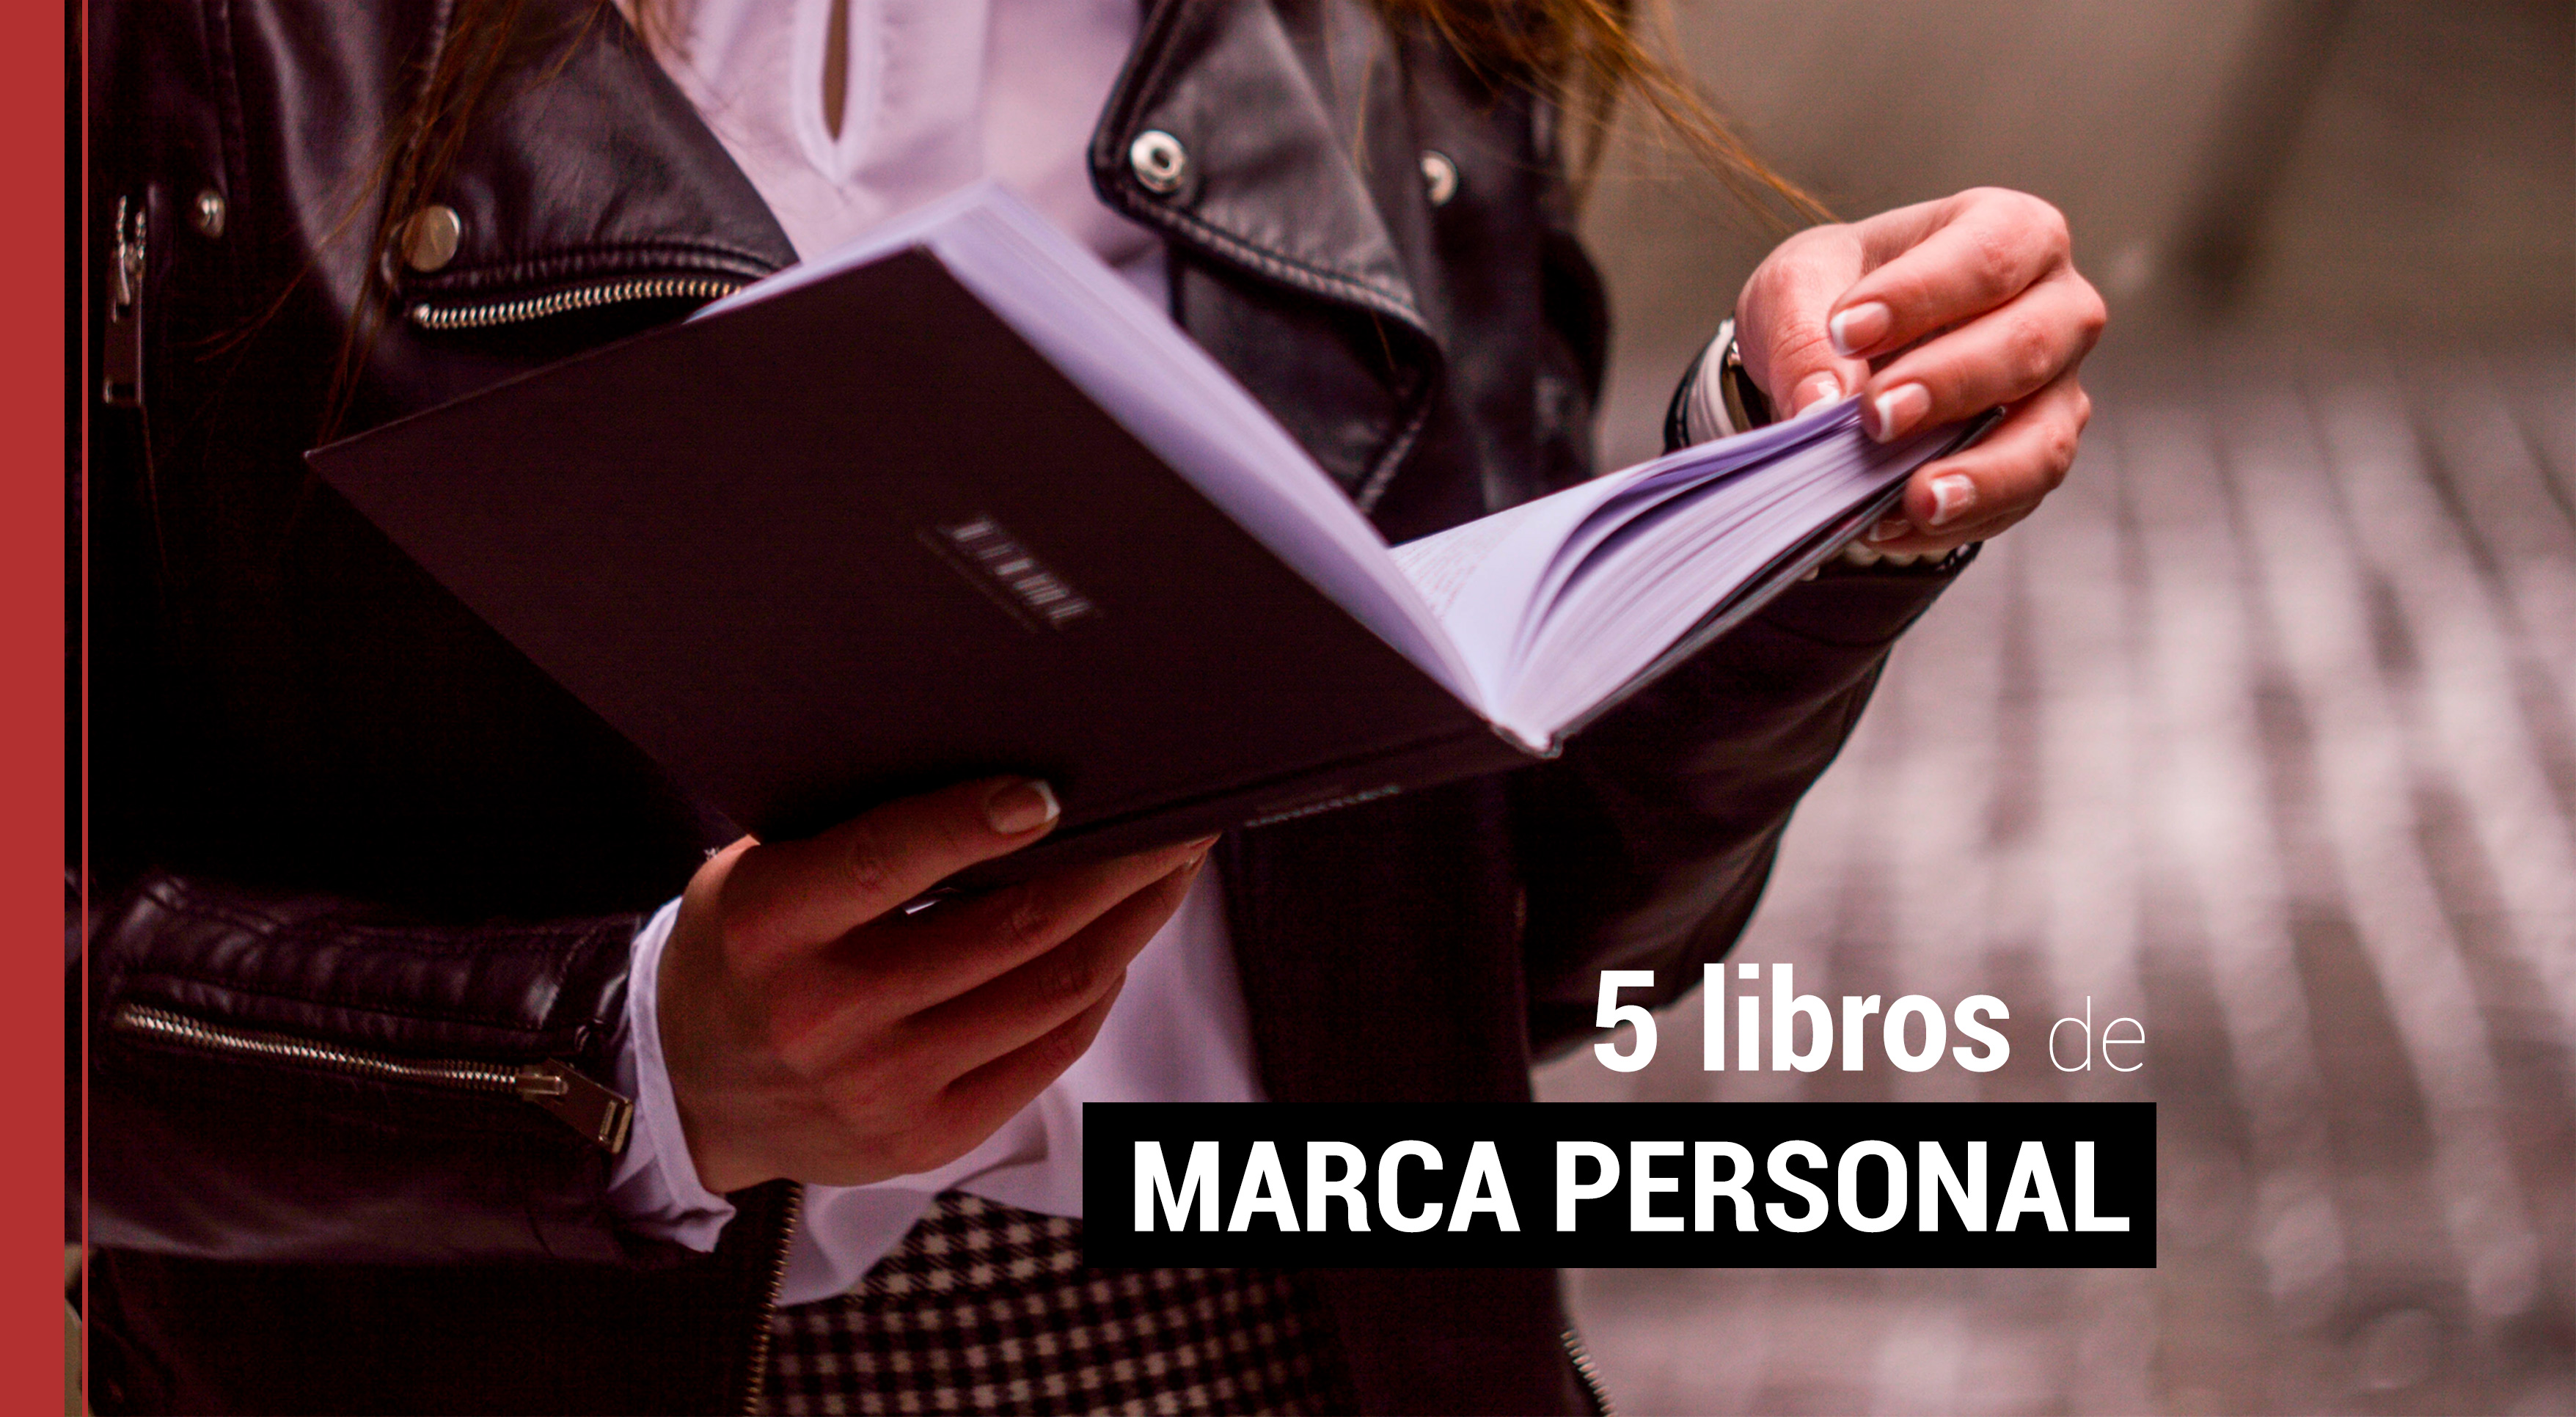 5-libros-sobre-marca-personal 5 libros útiles sobre marca personal que debes leer